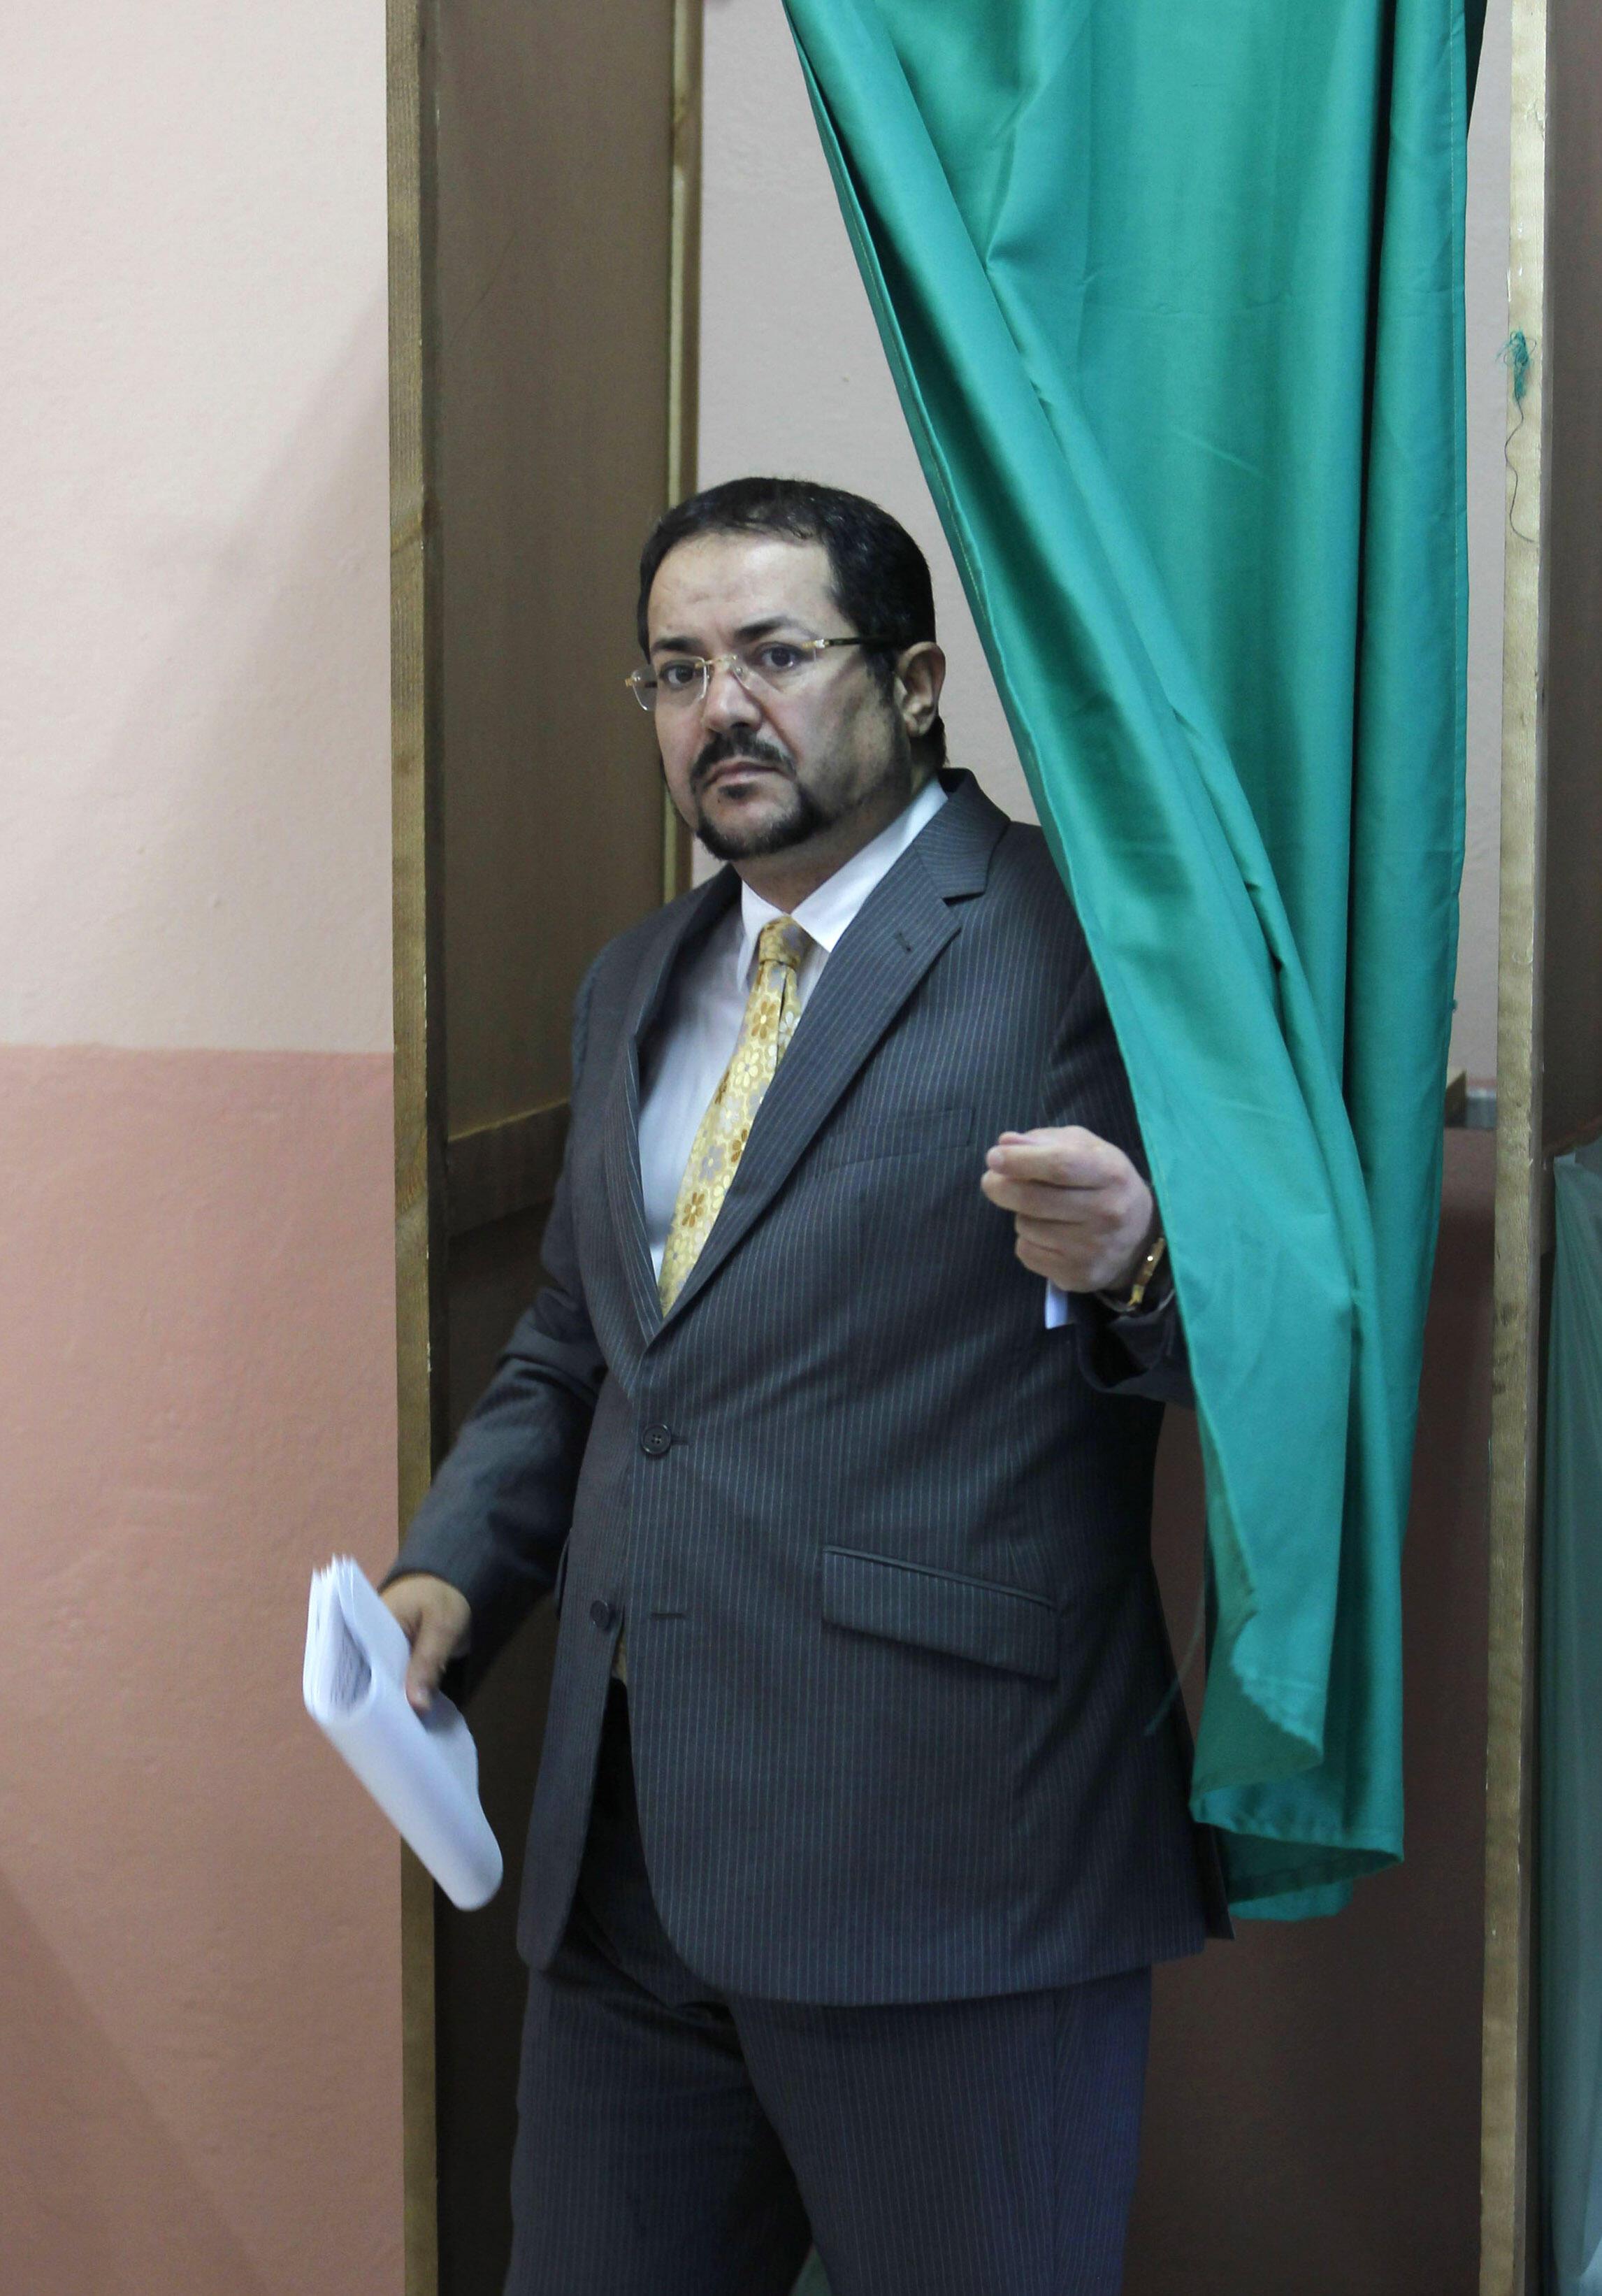 MSP leader Abdelmadjid Menasra votes